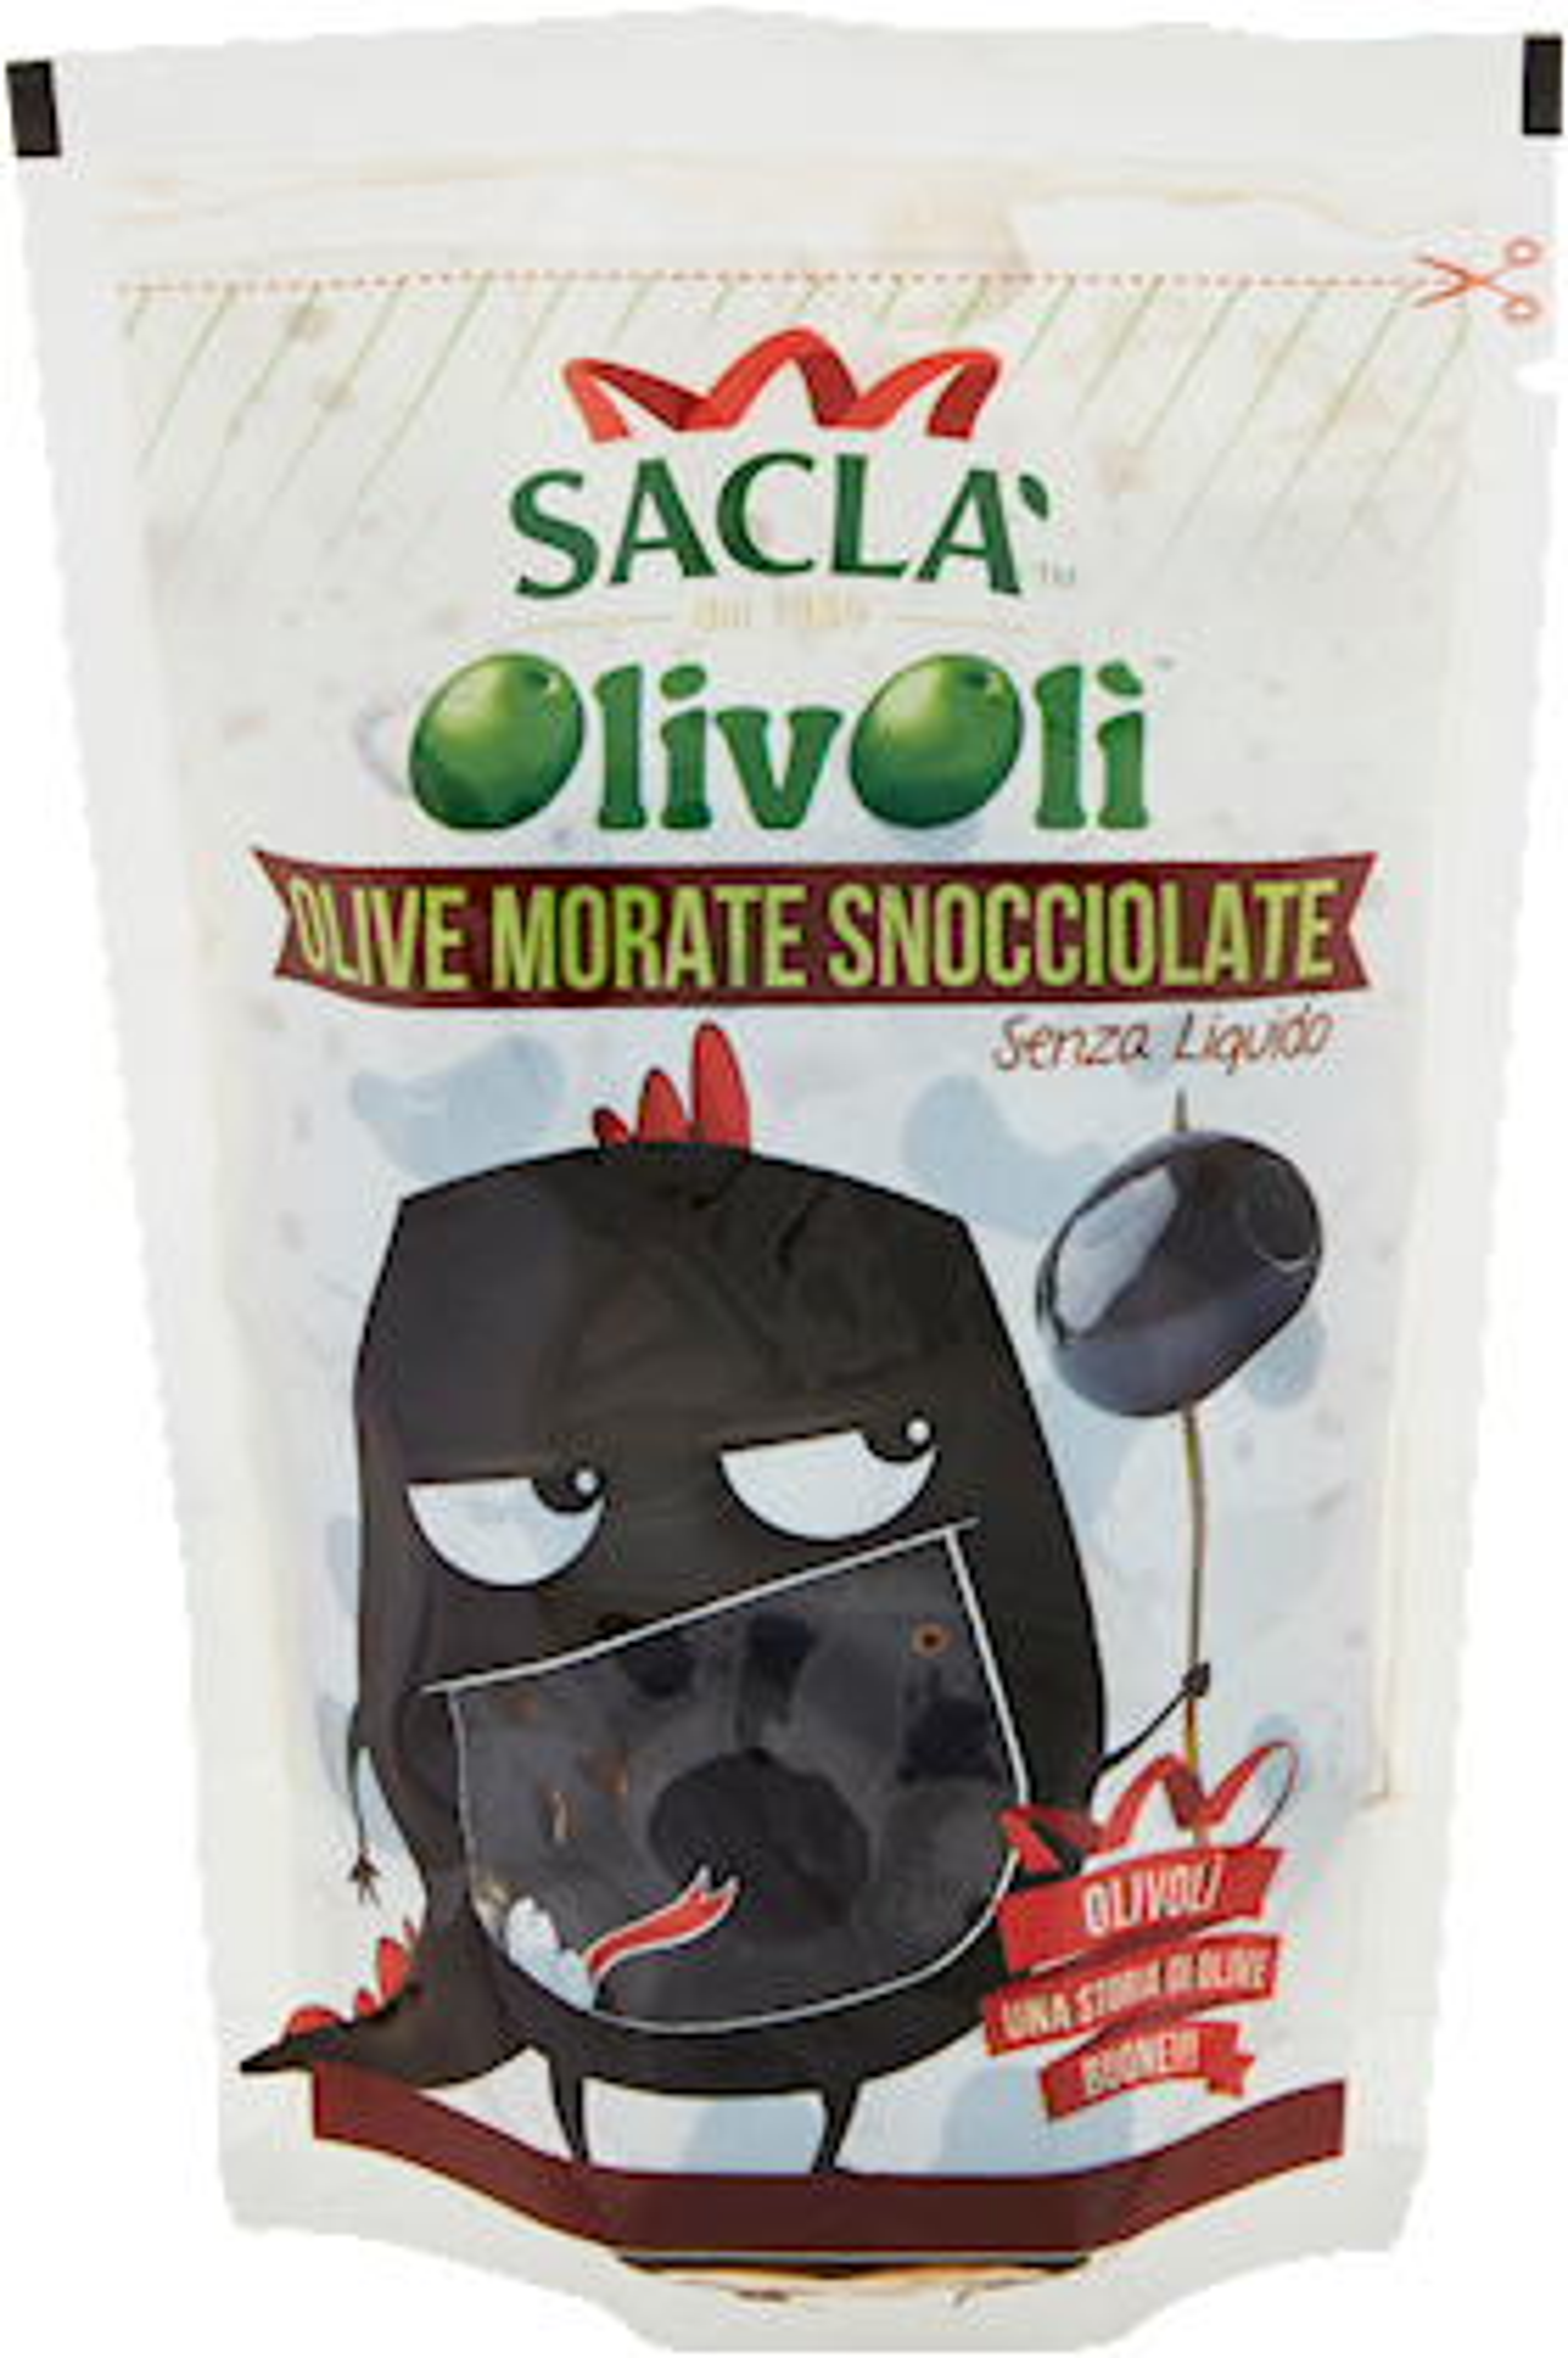 OLIVOLI' SACLA' 75G PAK SNOCCIOLATE